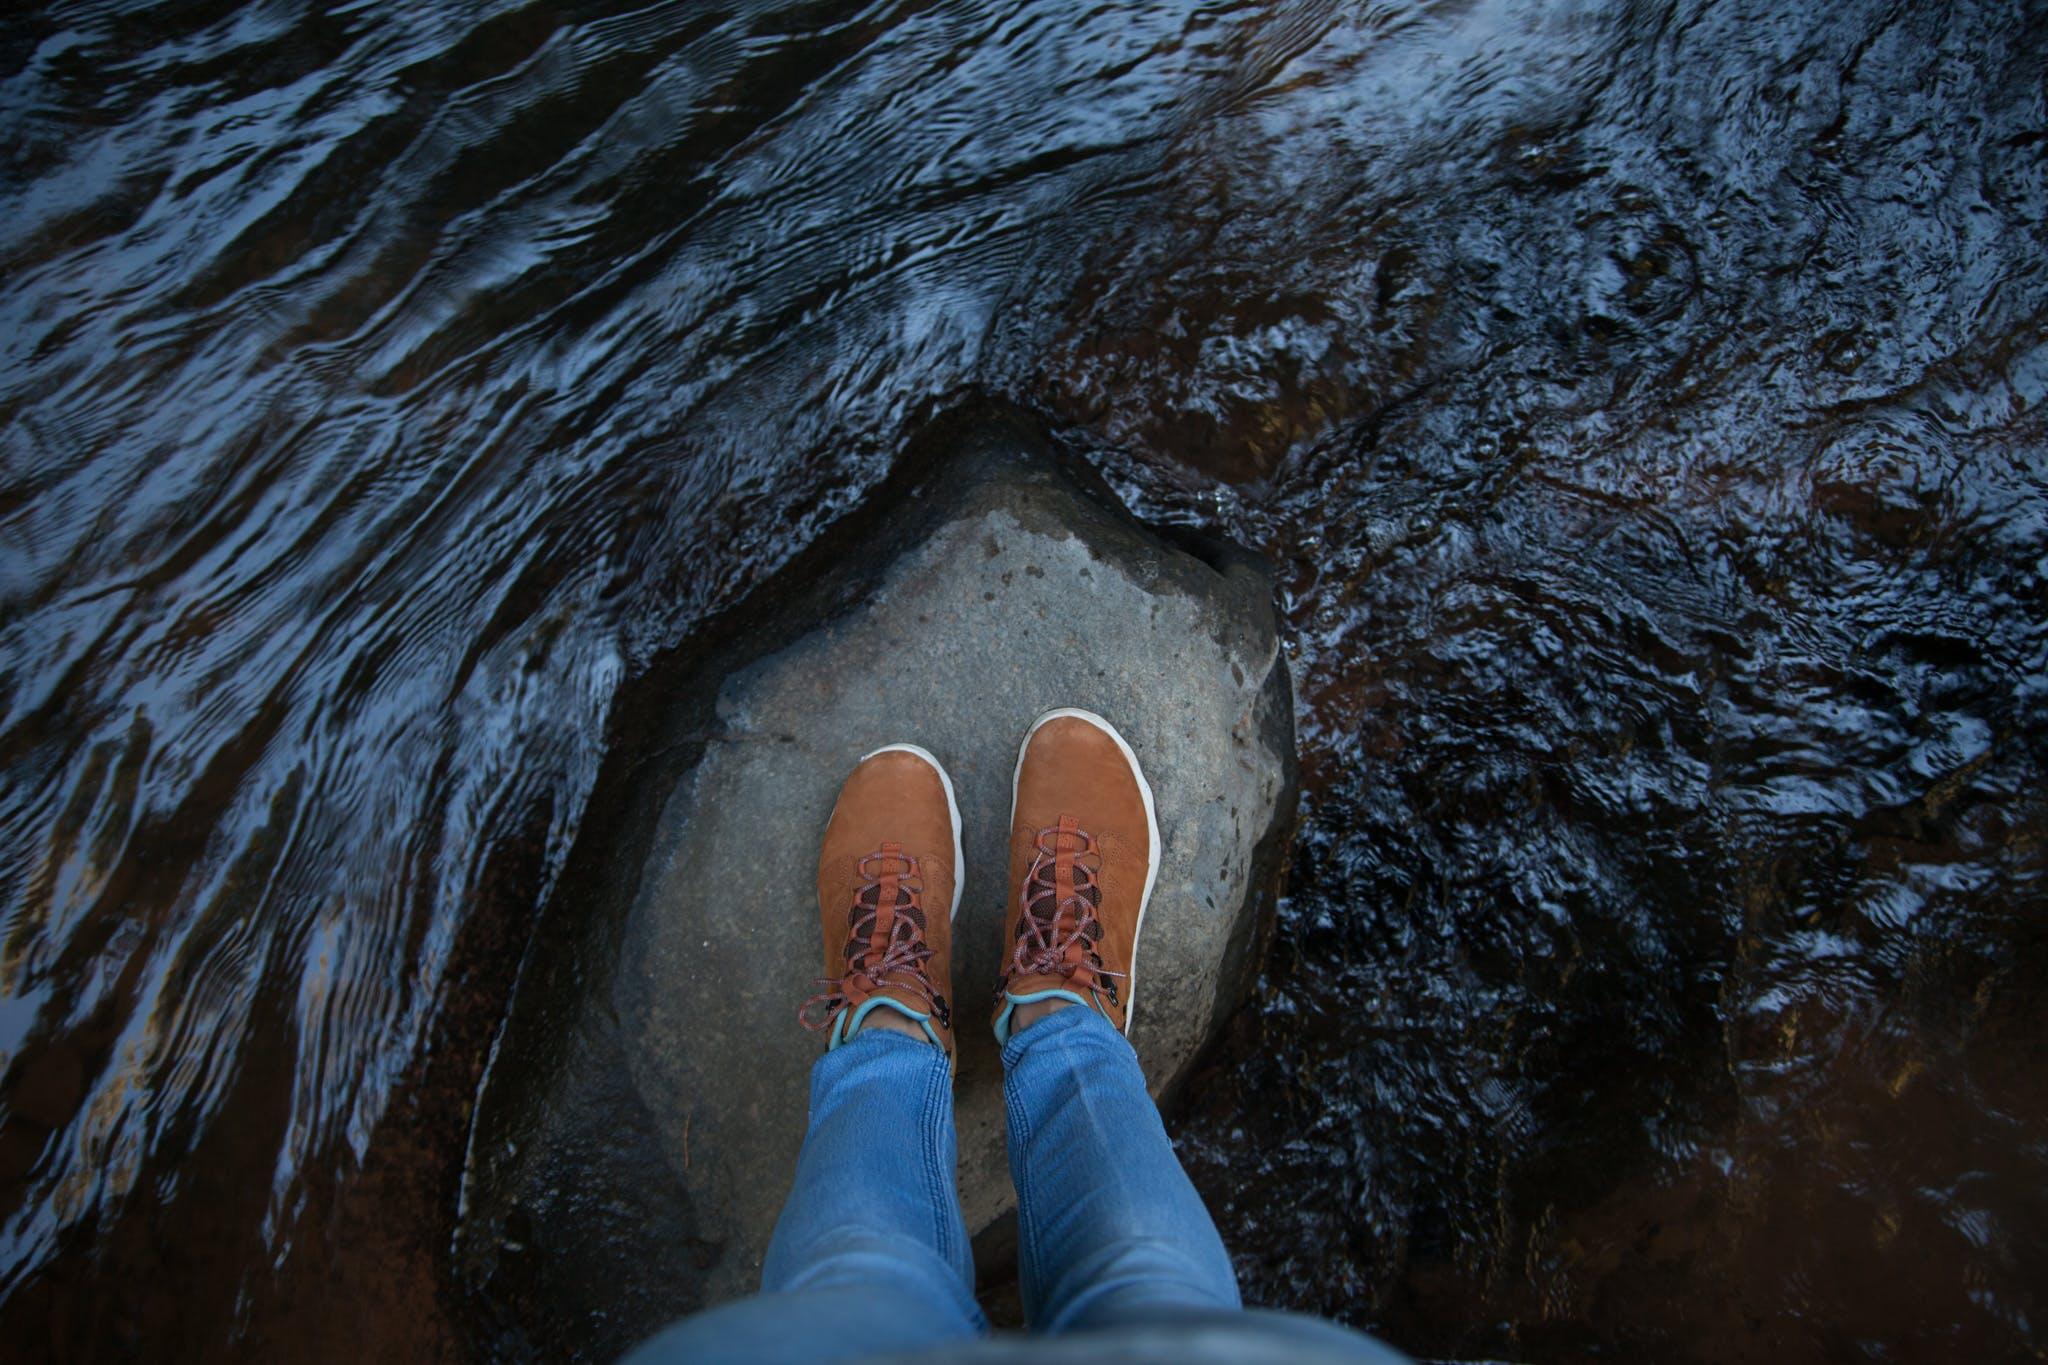 Person Standing on Rock in Between Running Water